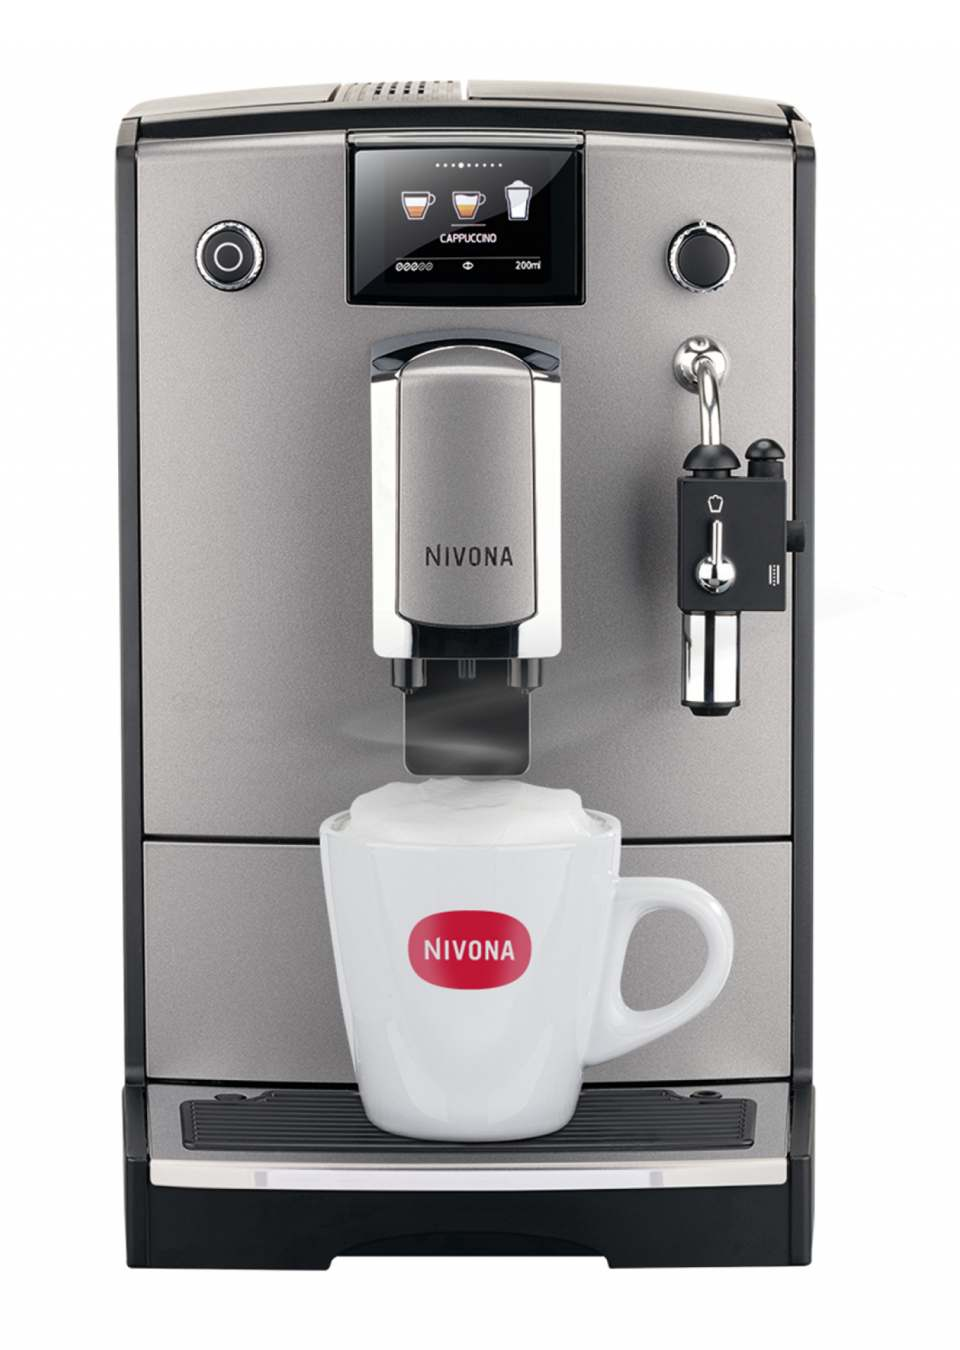 Nivona Kaffeevollautomat NICR 675 mit Aromatica System.